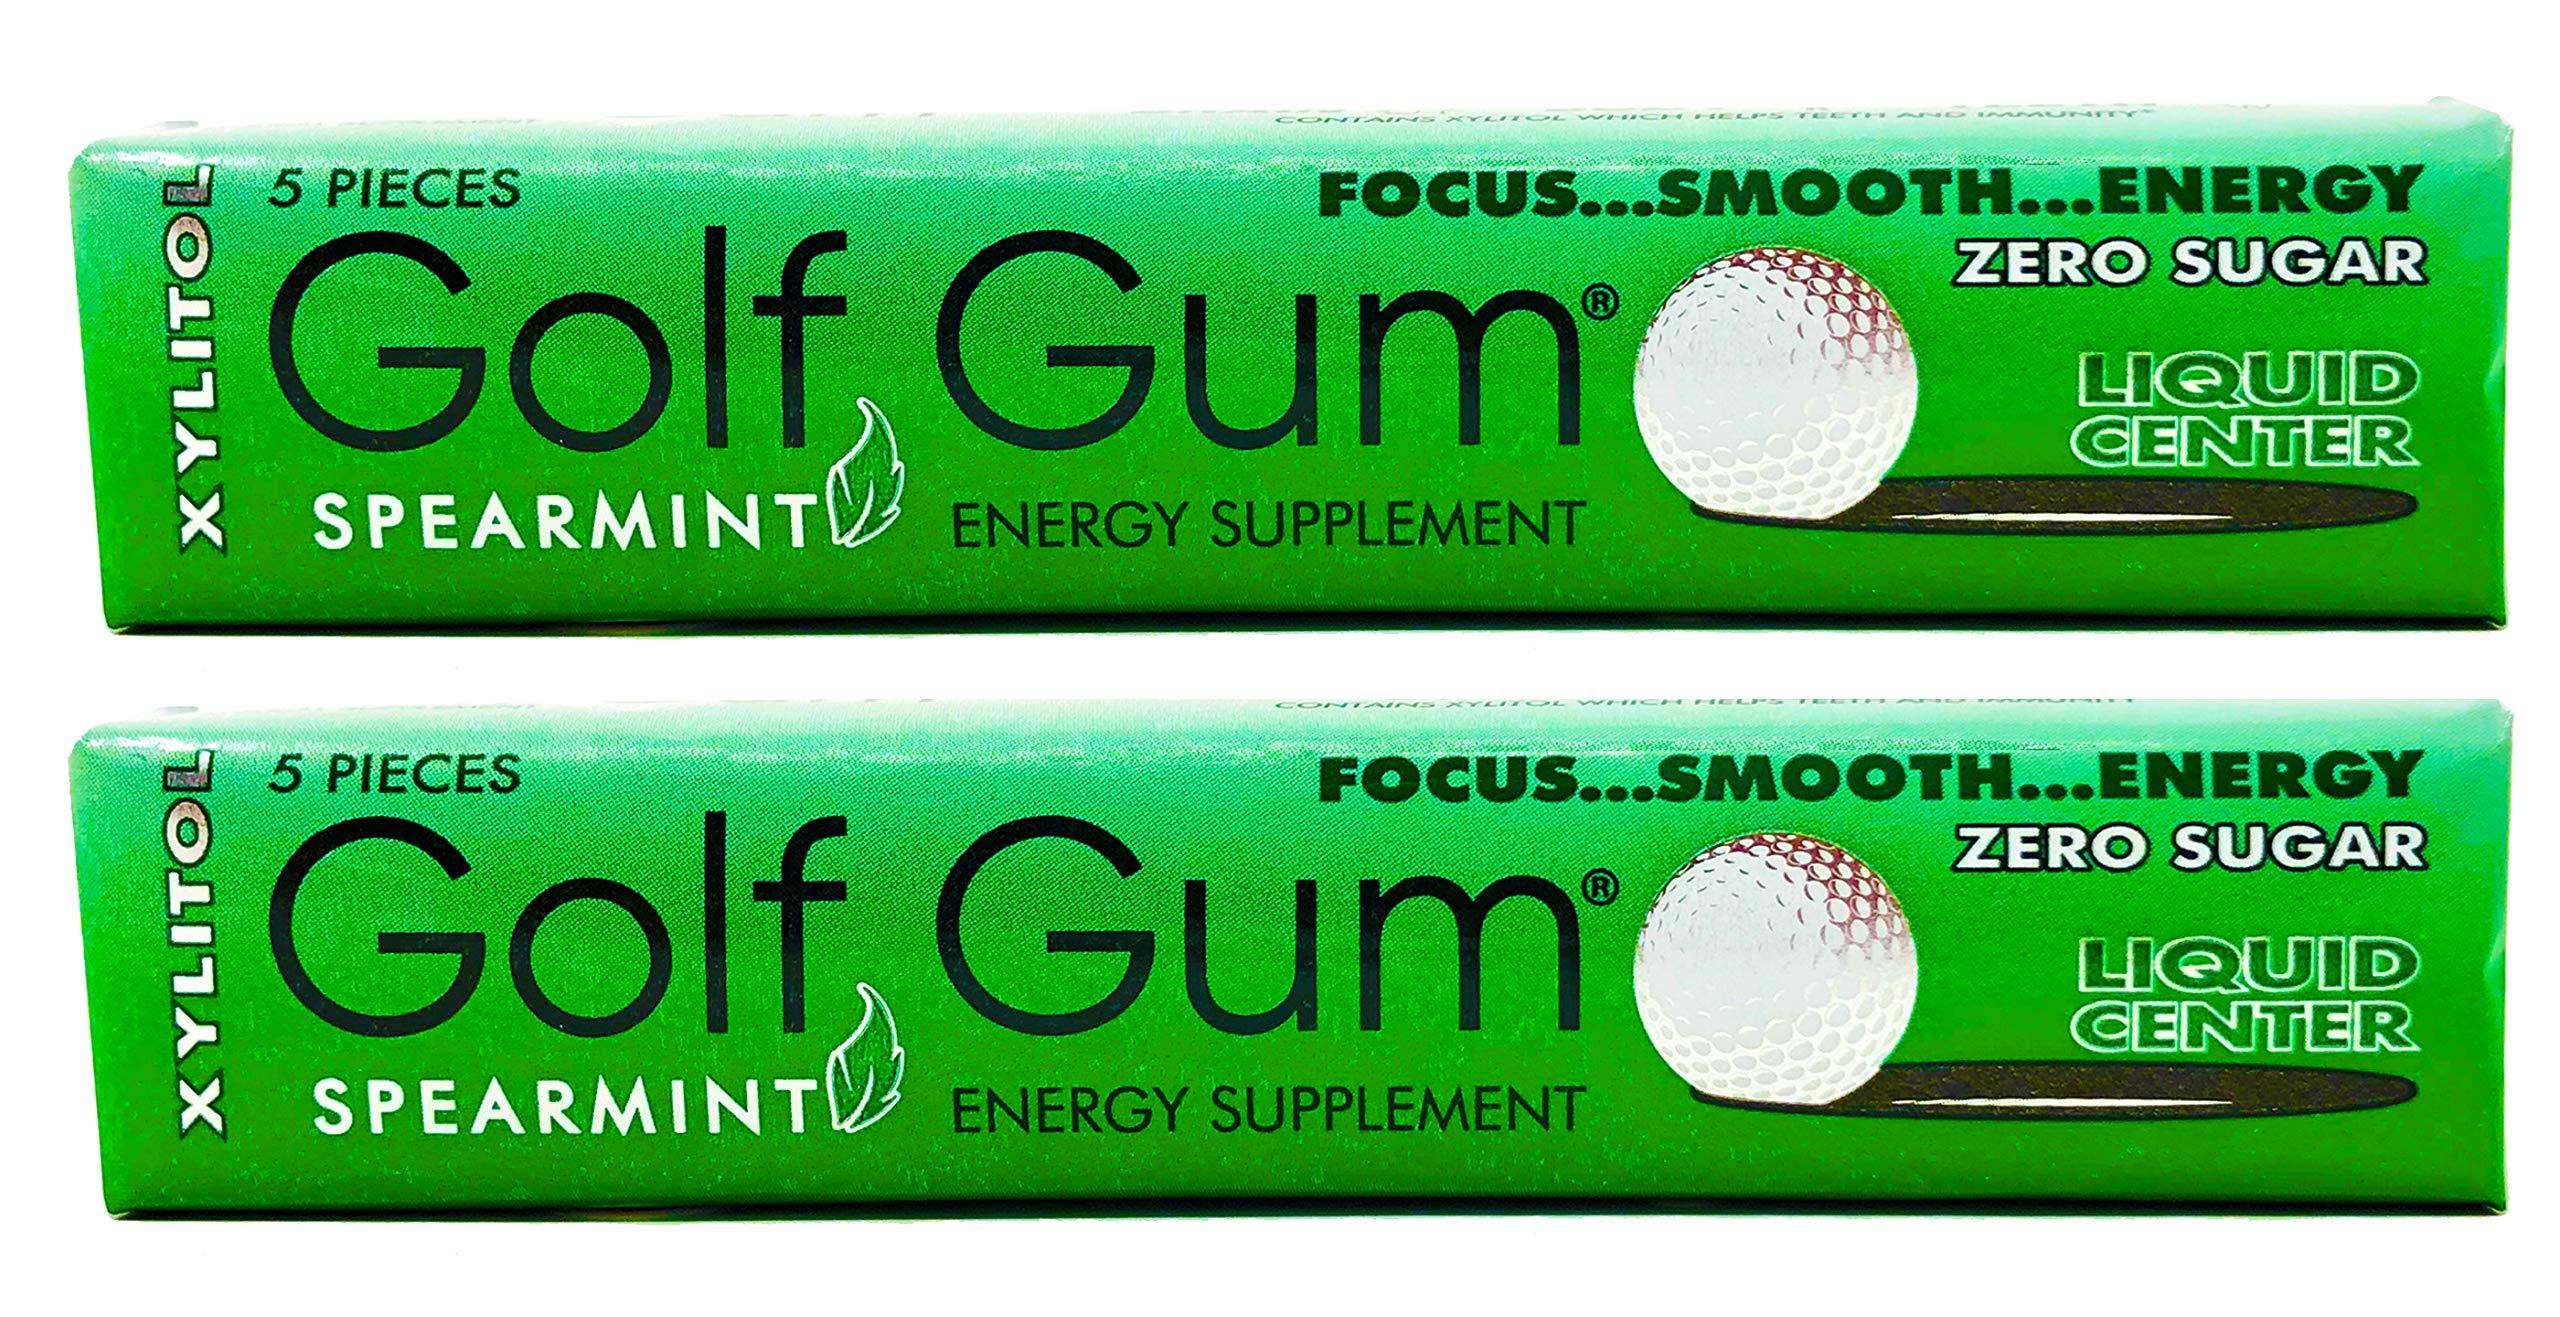 Golf Gum - The Golfers Gum - Liquid Core Xylitol Gum - Sugar-Free, Aspartame-Free, Caffeinated Gum - Spearmint - 5 Pieces of Gum Per Pack (2 Pack) by Golf Gum